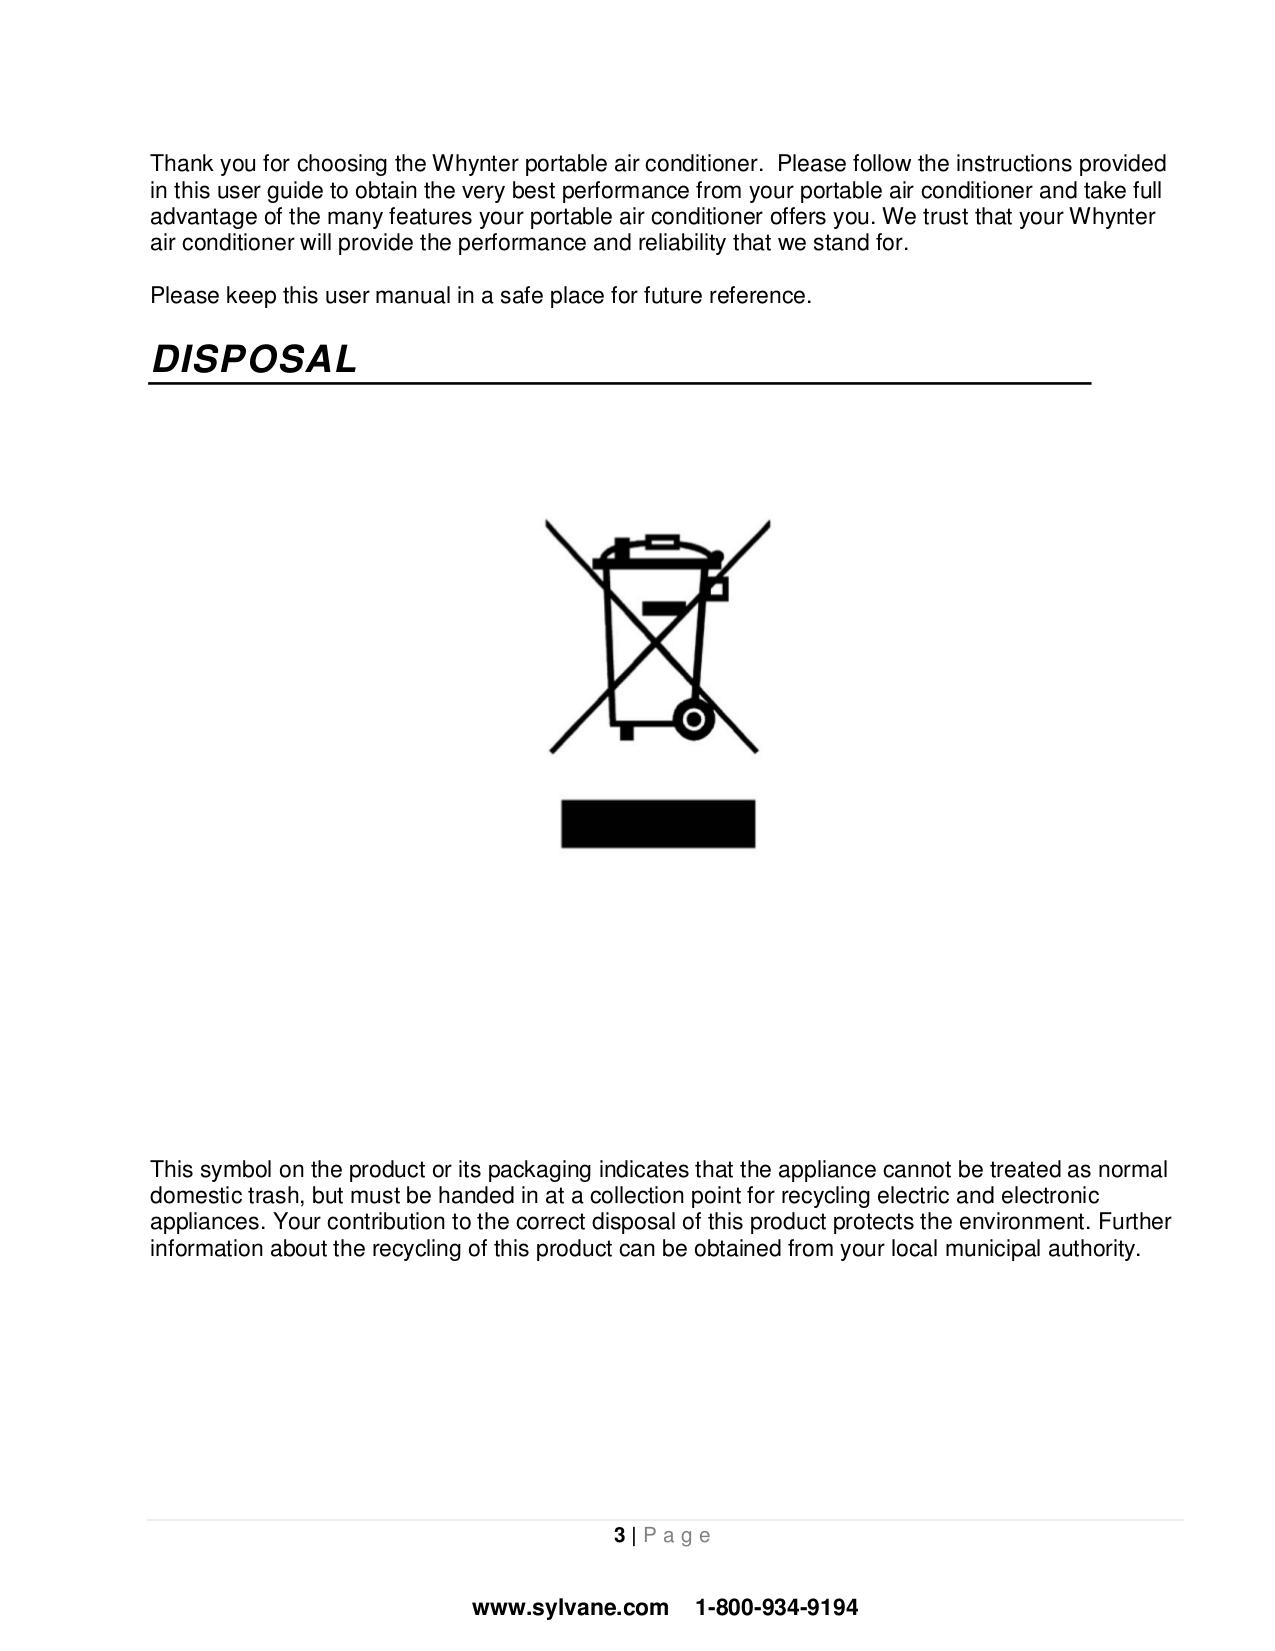 samsung air conditioner manual pdf